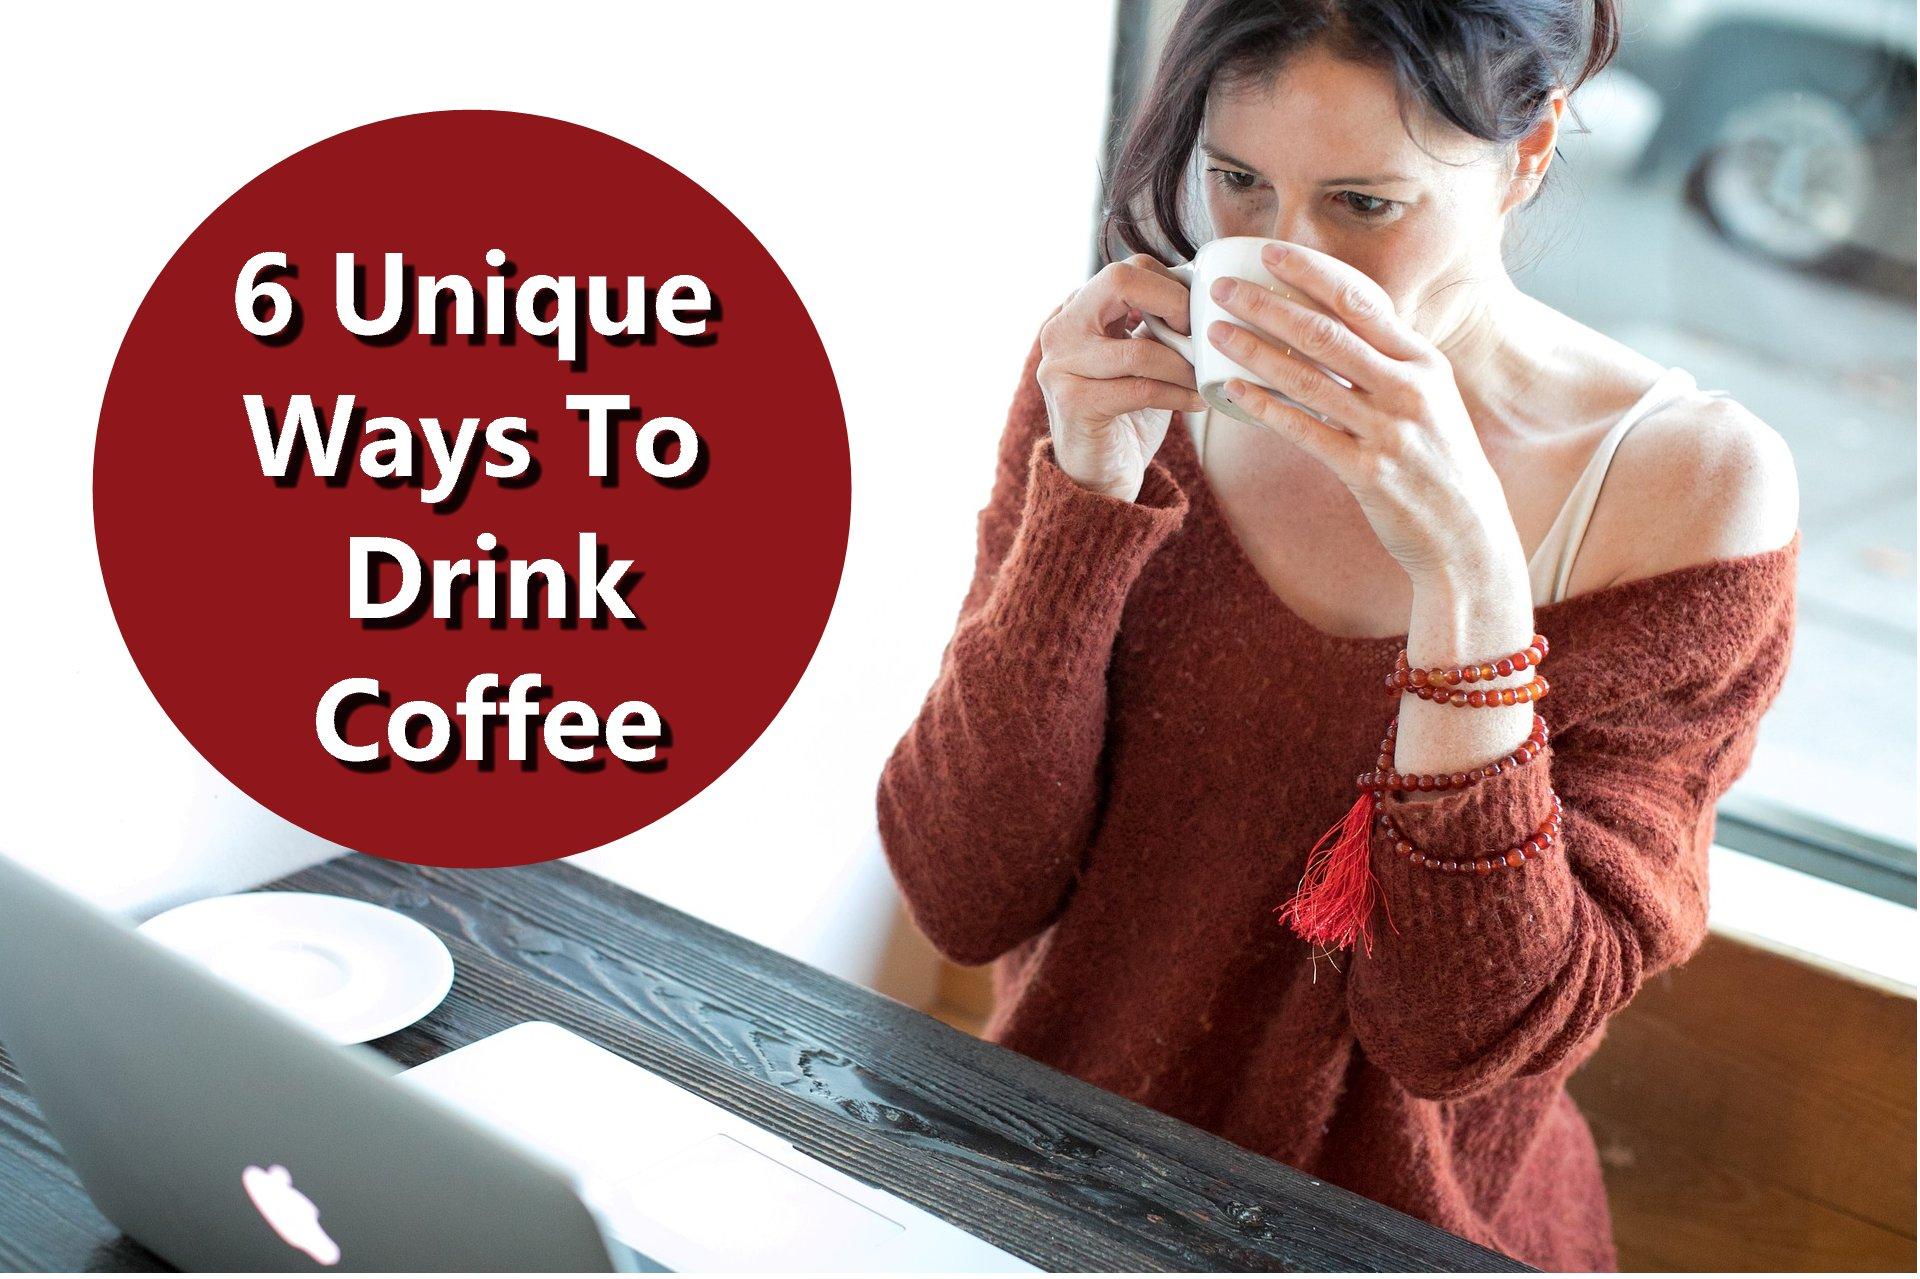 6 Unique Ways to Drink Coffee